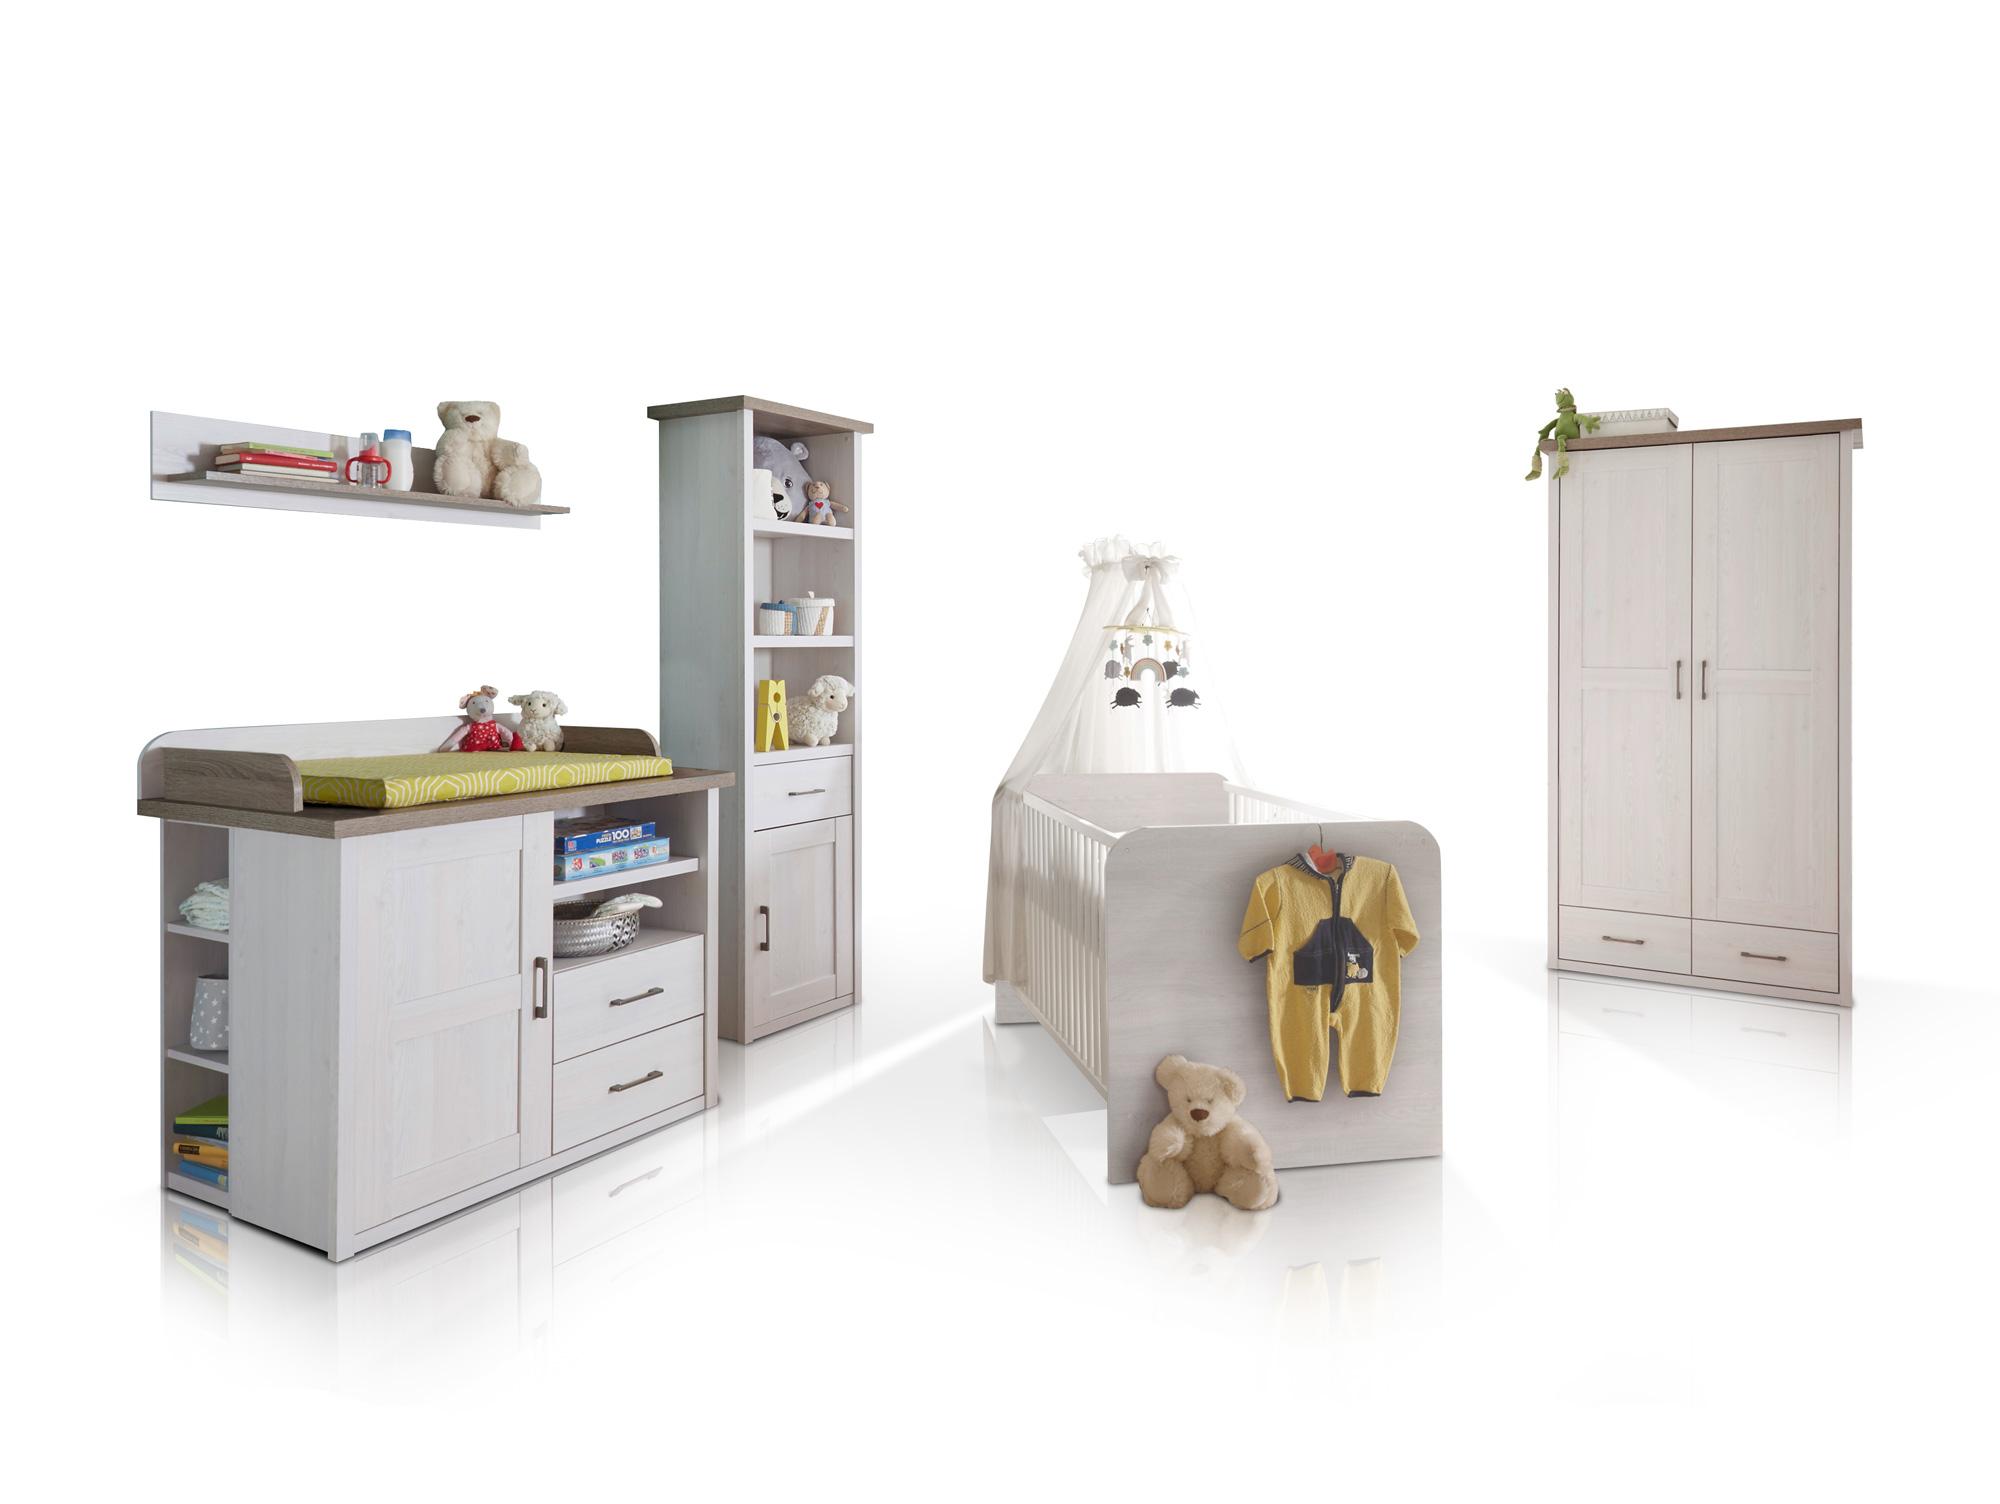 luba babyzimmer pinie wei tr ffel. Black Bedroom Furniture Sets. Home Design Ideas